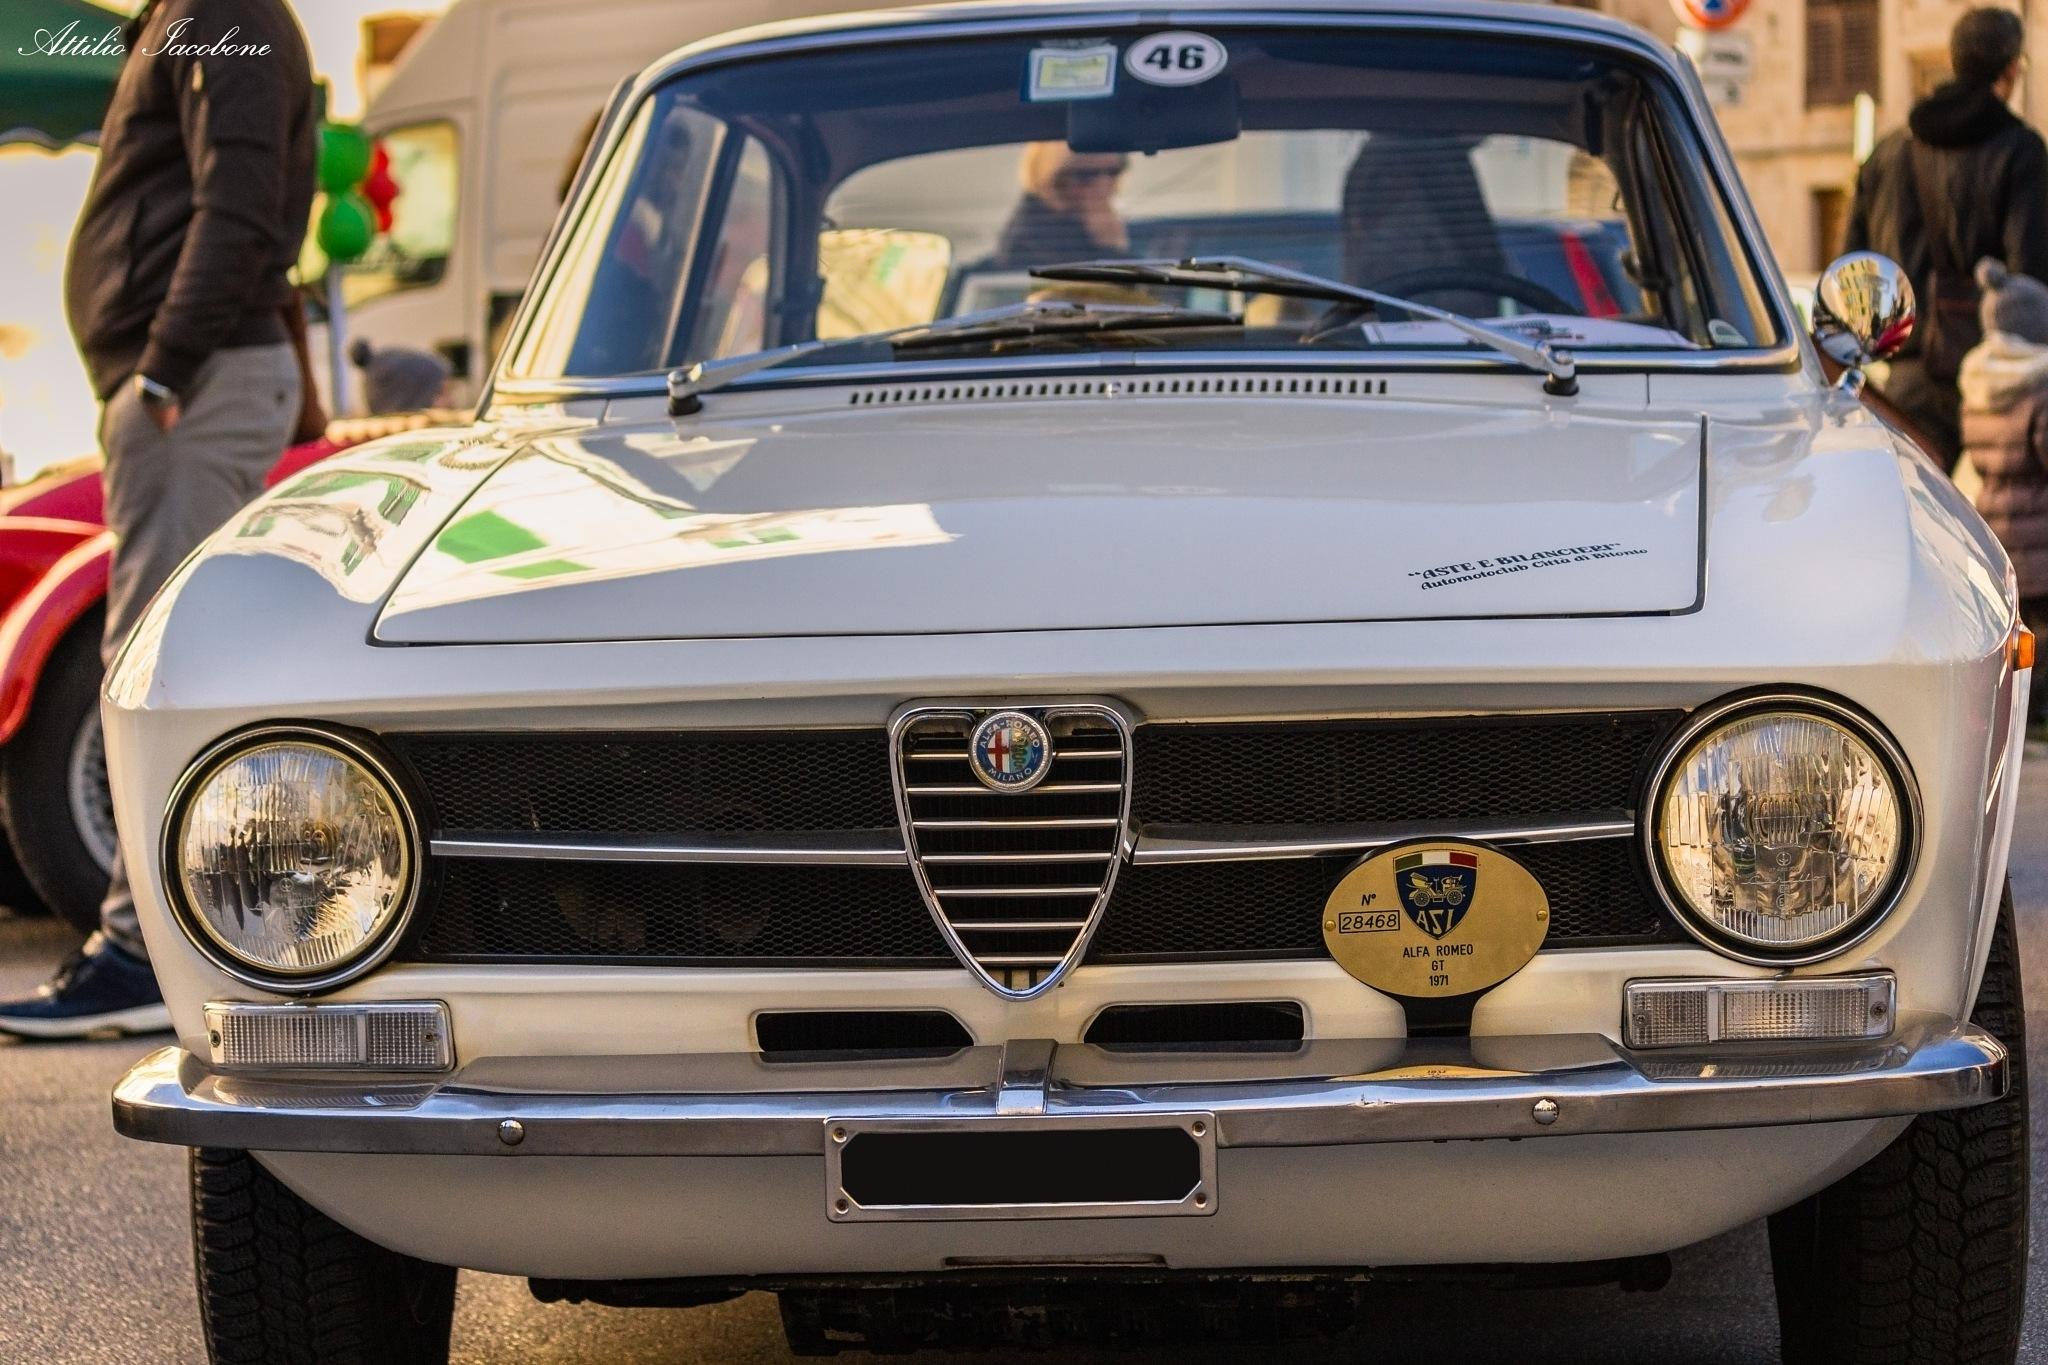 Alfa Romeo GT 1971 by Attilio Iacobone